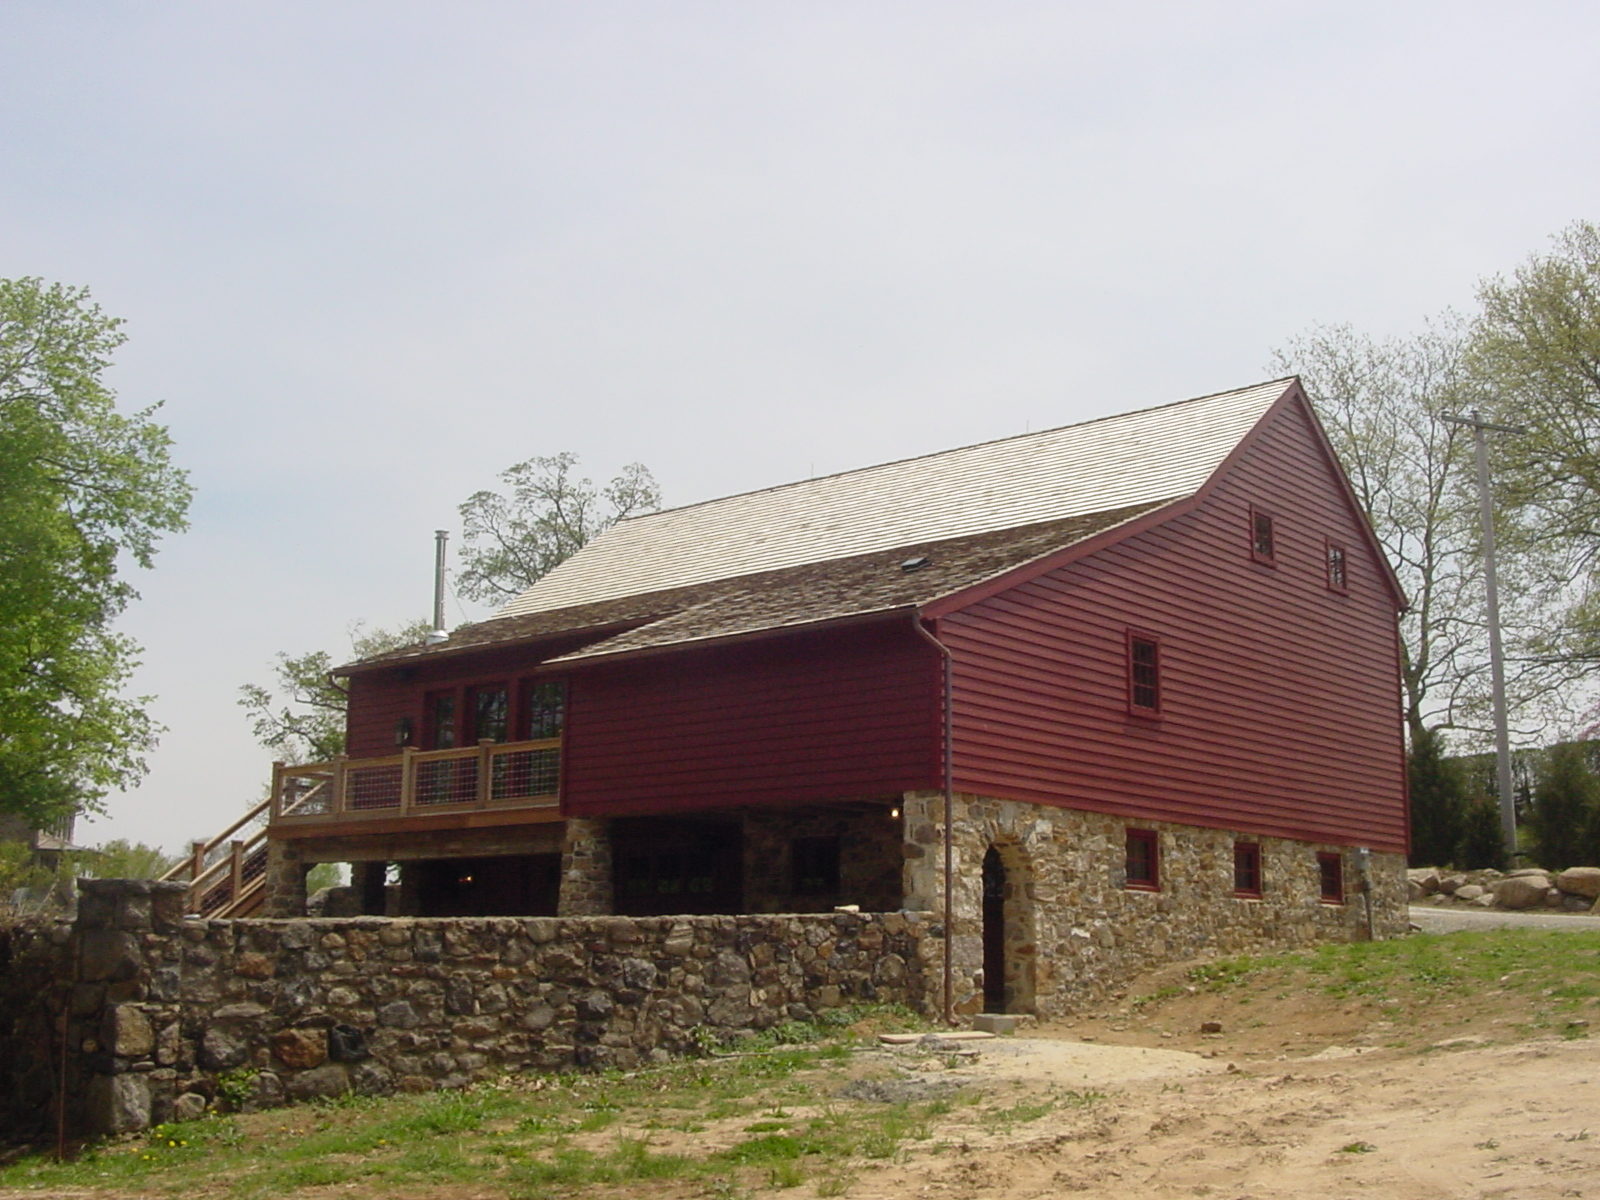 Luxury barn builders newtown square pa for Luxury barn builders